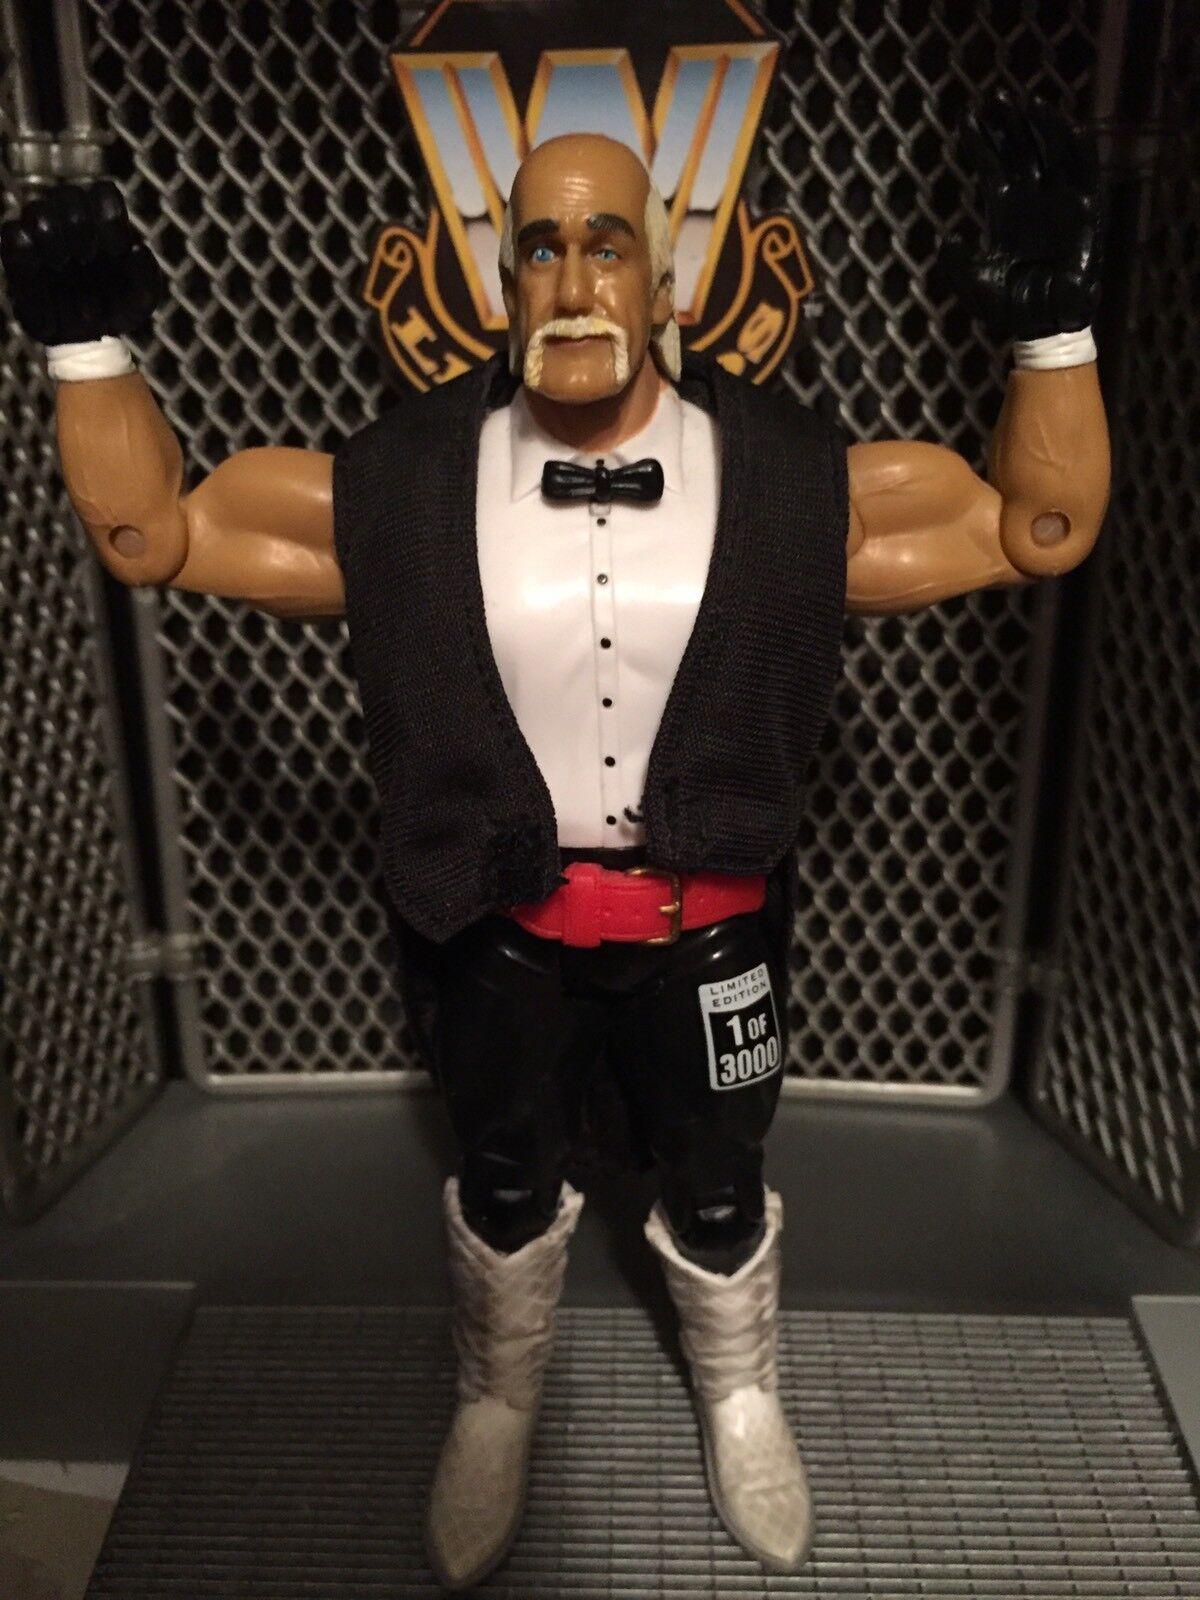 WWE Hulk Hogan wrestling figure Classic Superstars HOF Ceremony AWA NWO WCW Toy